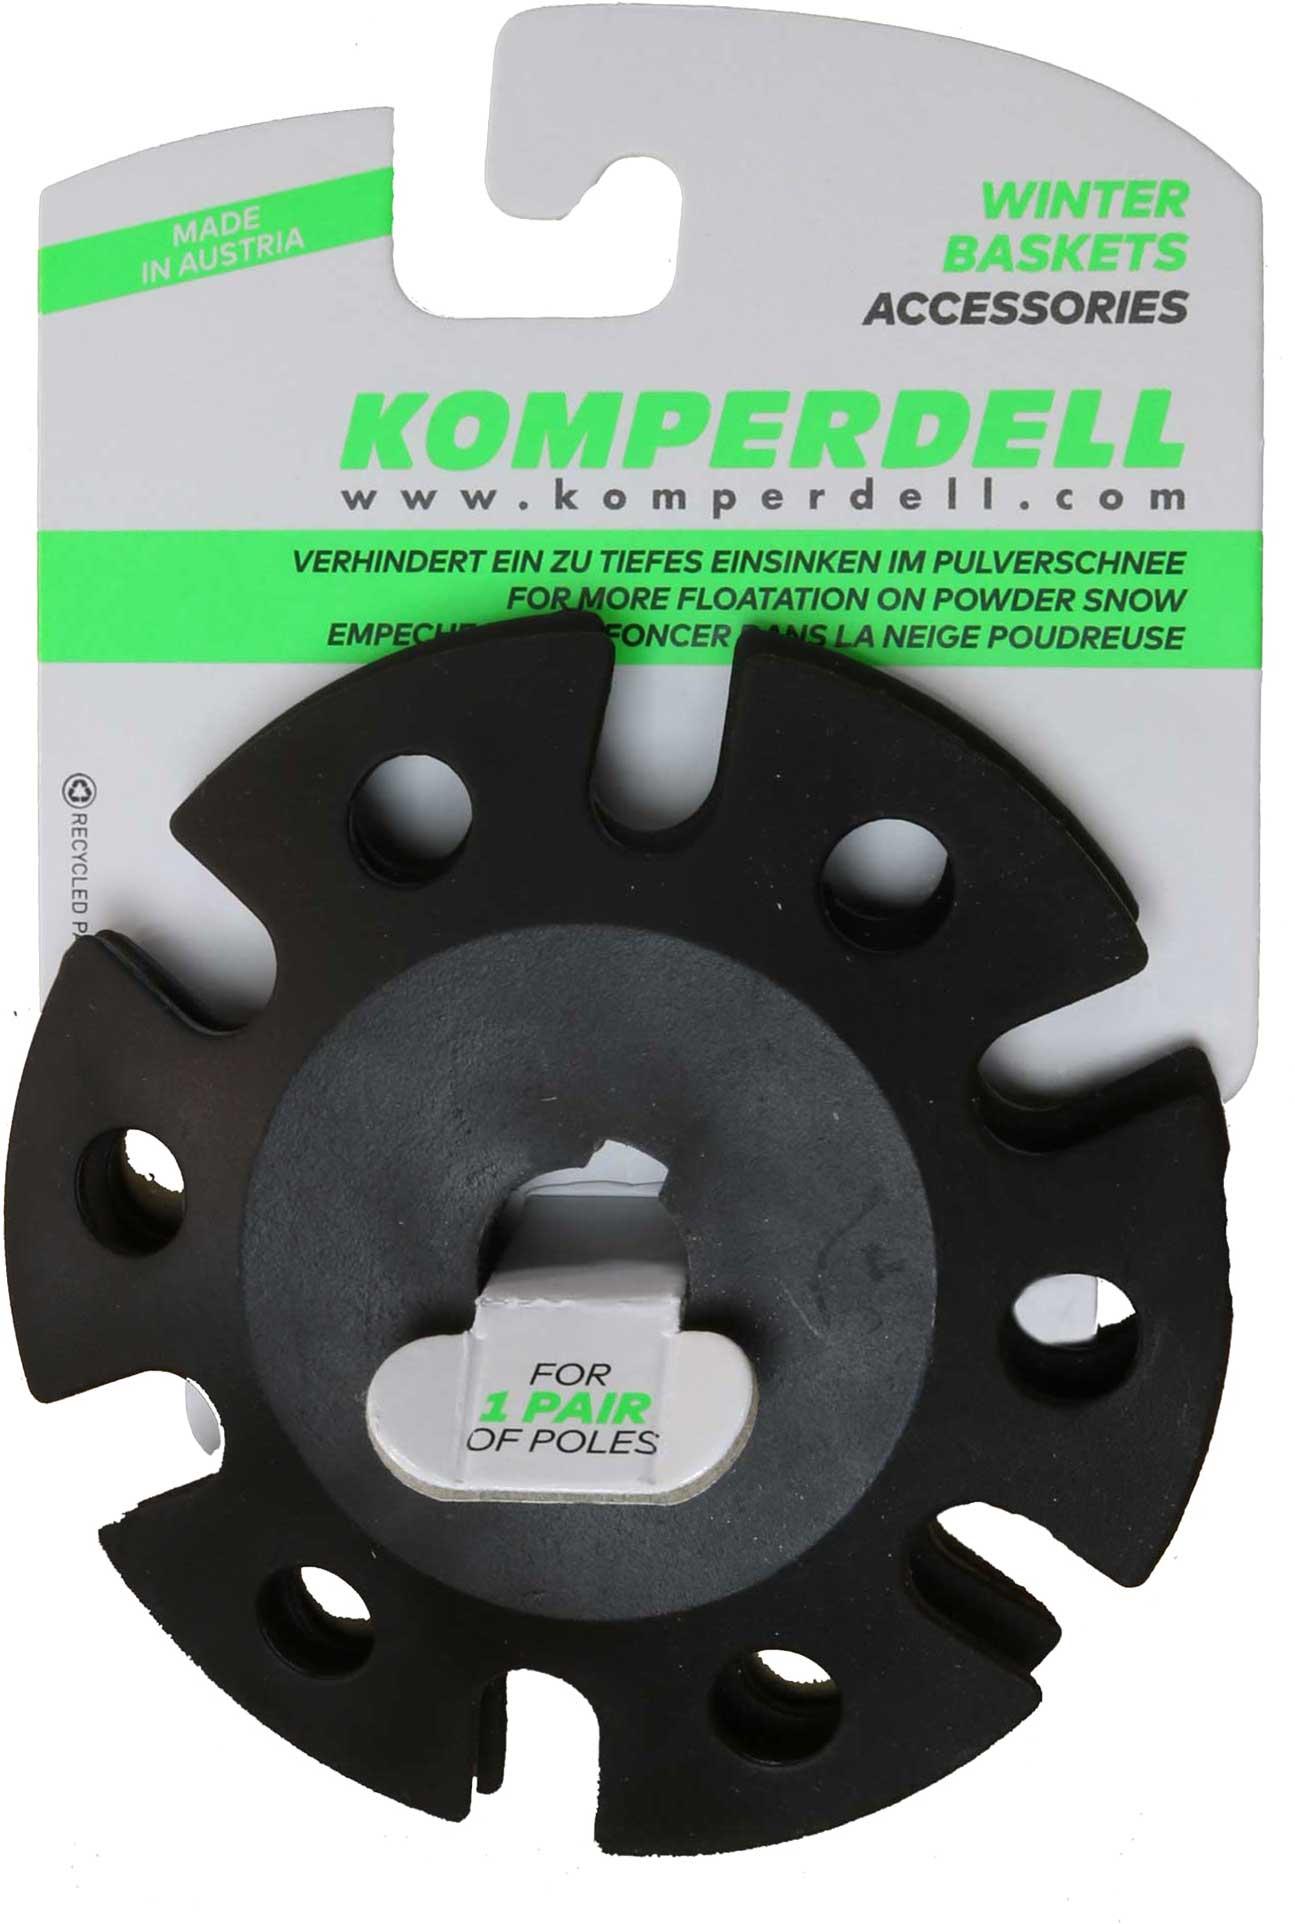 Imagem de Komperdell Basket Vario Extra Large (pair)